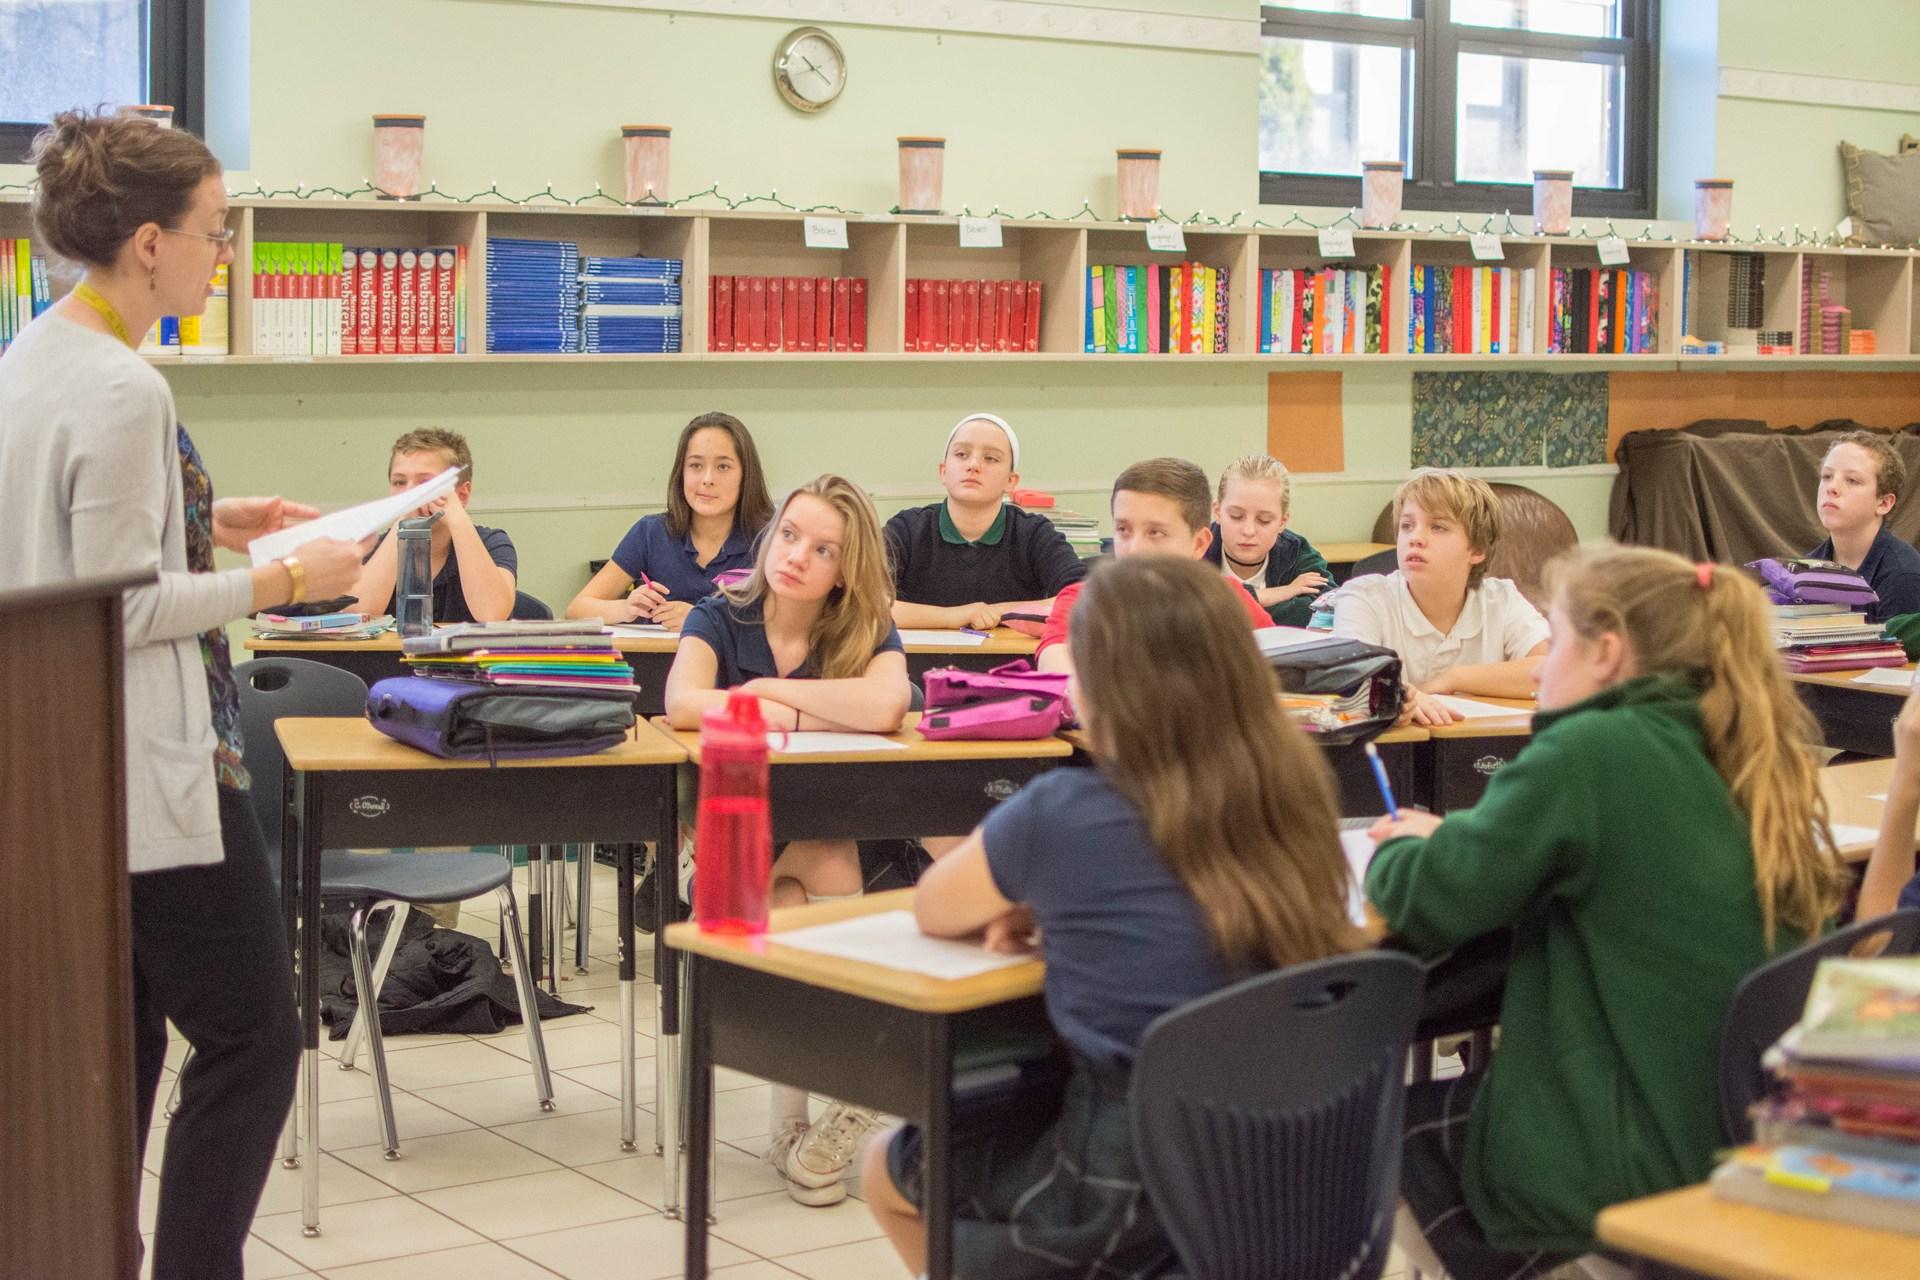 Middle School Hallway Students